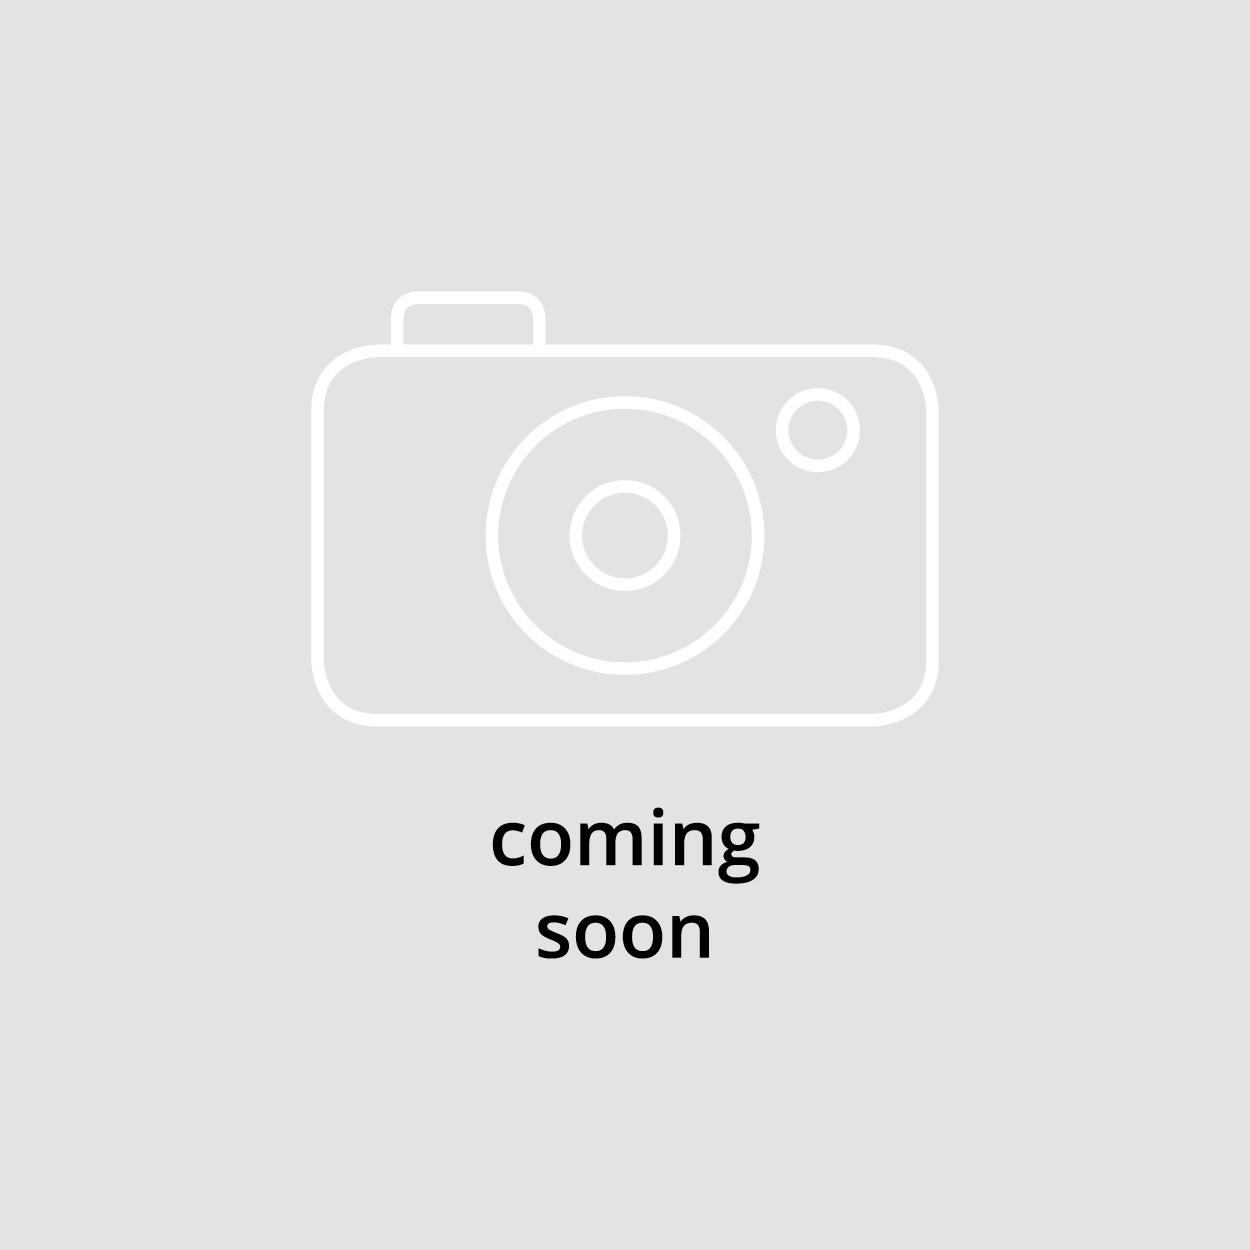 53.26.159 Albero per comando slitta radiale pos. 4 Gildemeister GM16AC